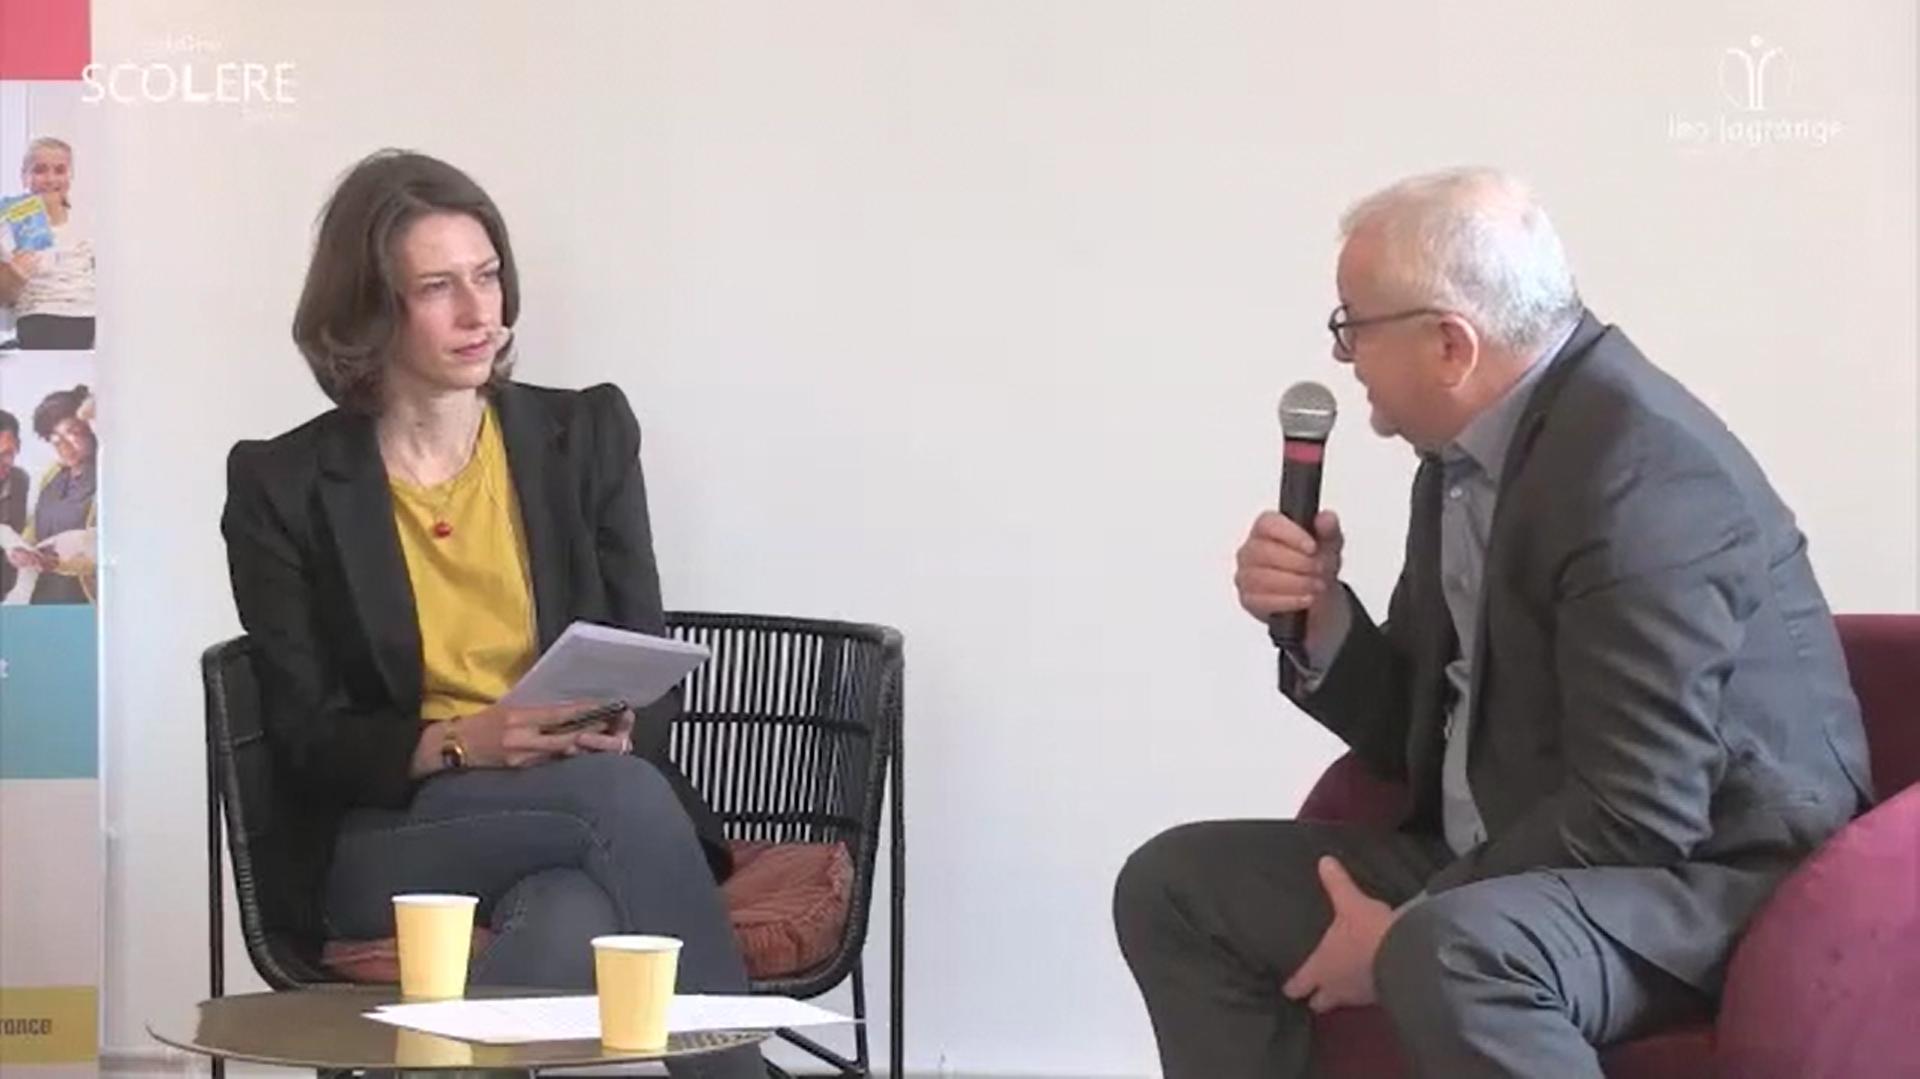 Conférence de presse Carbone Scol'ERE France2